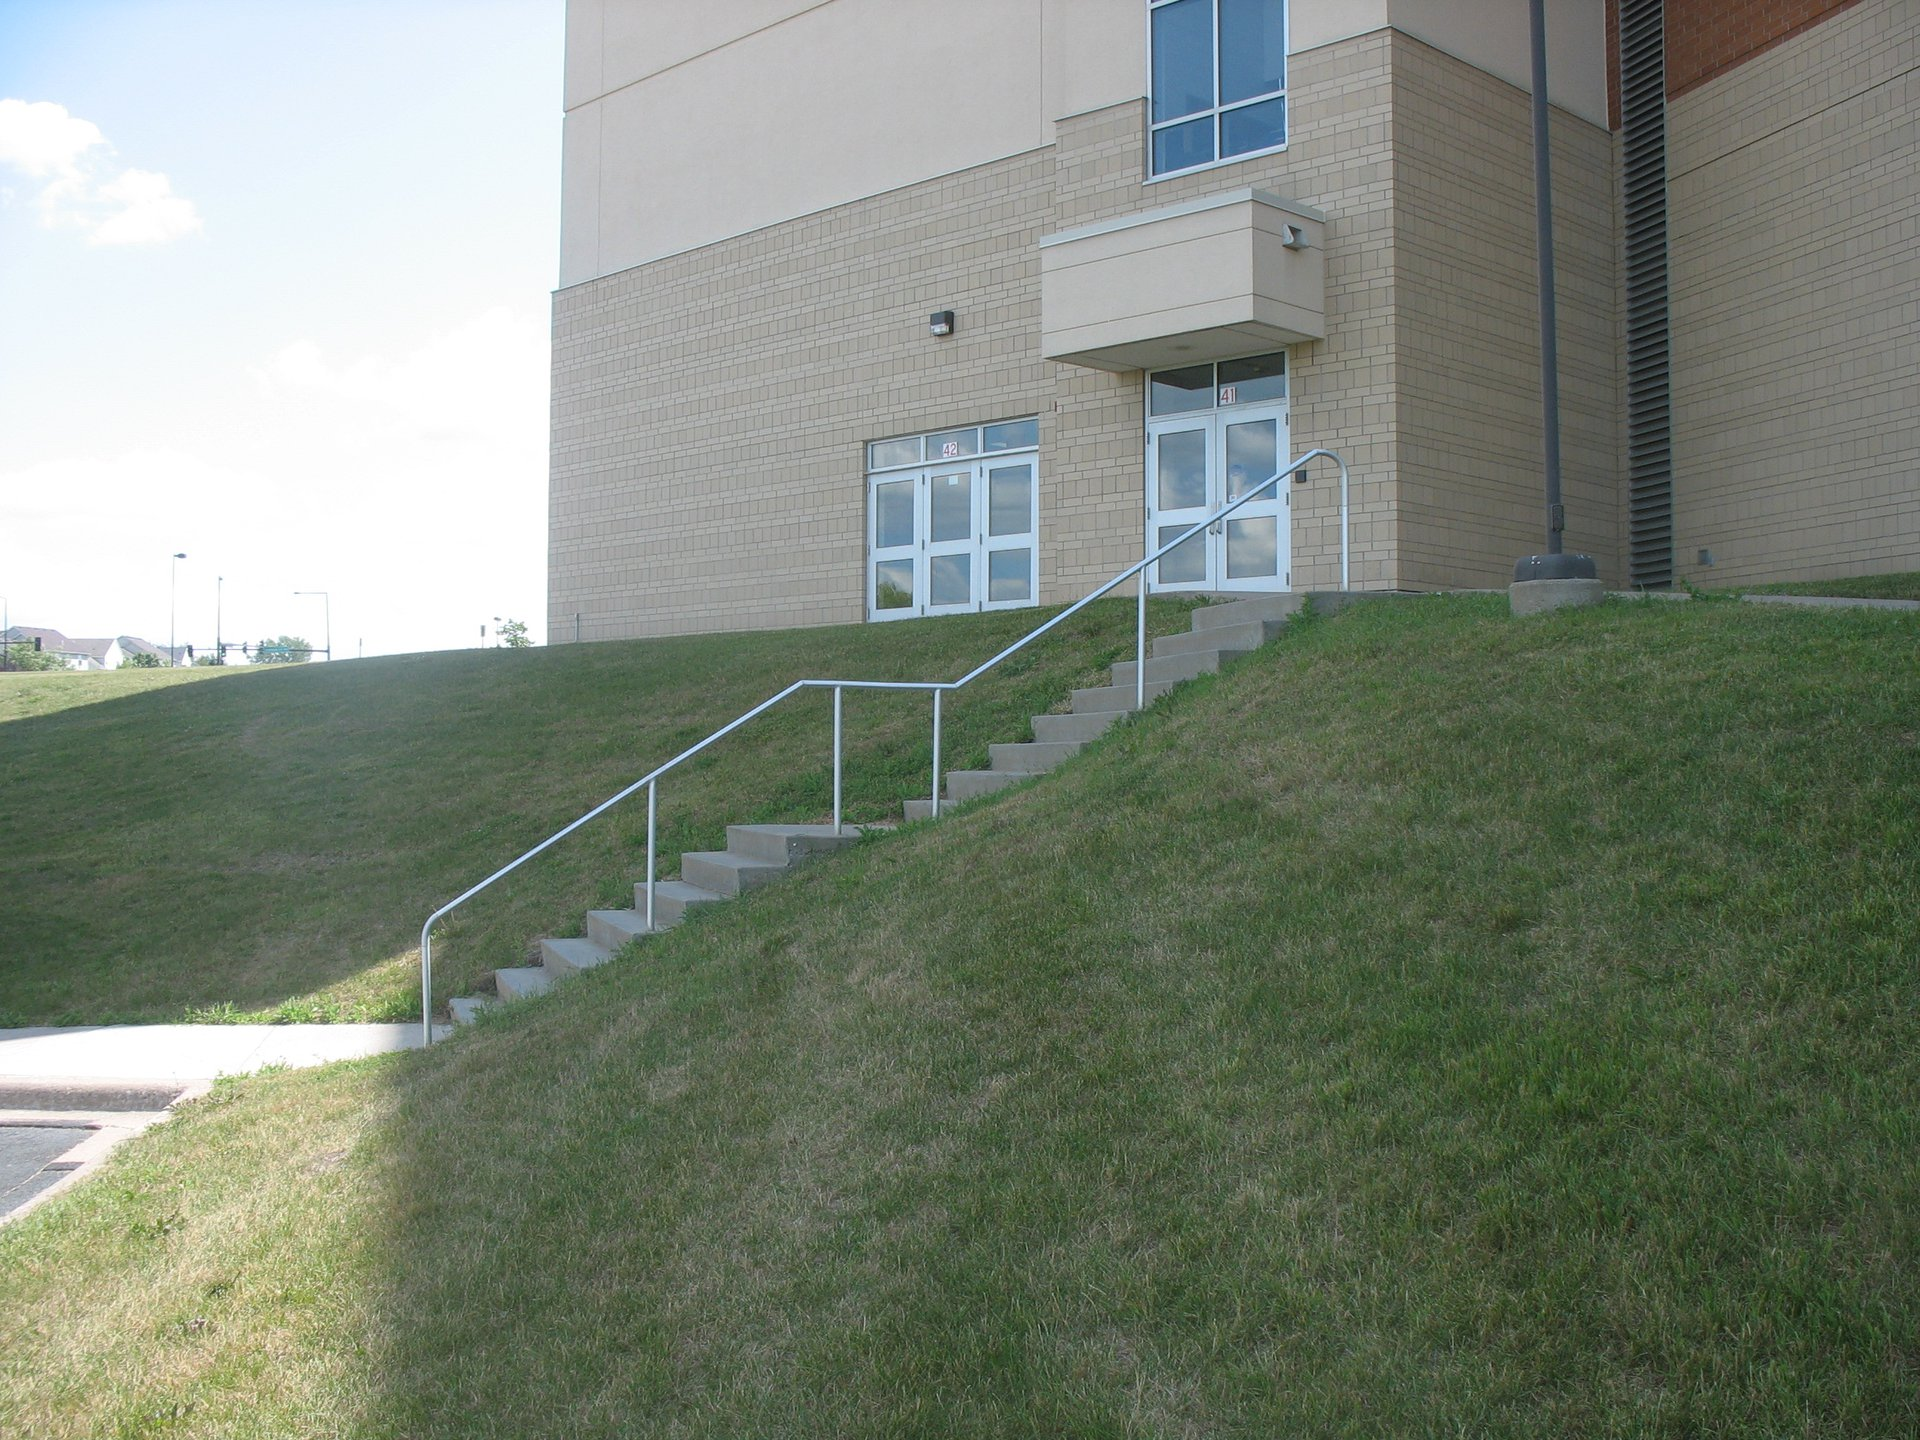 Urban dfd handrail